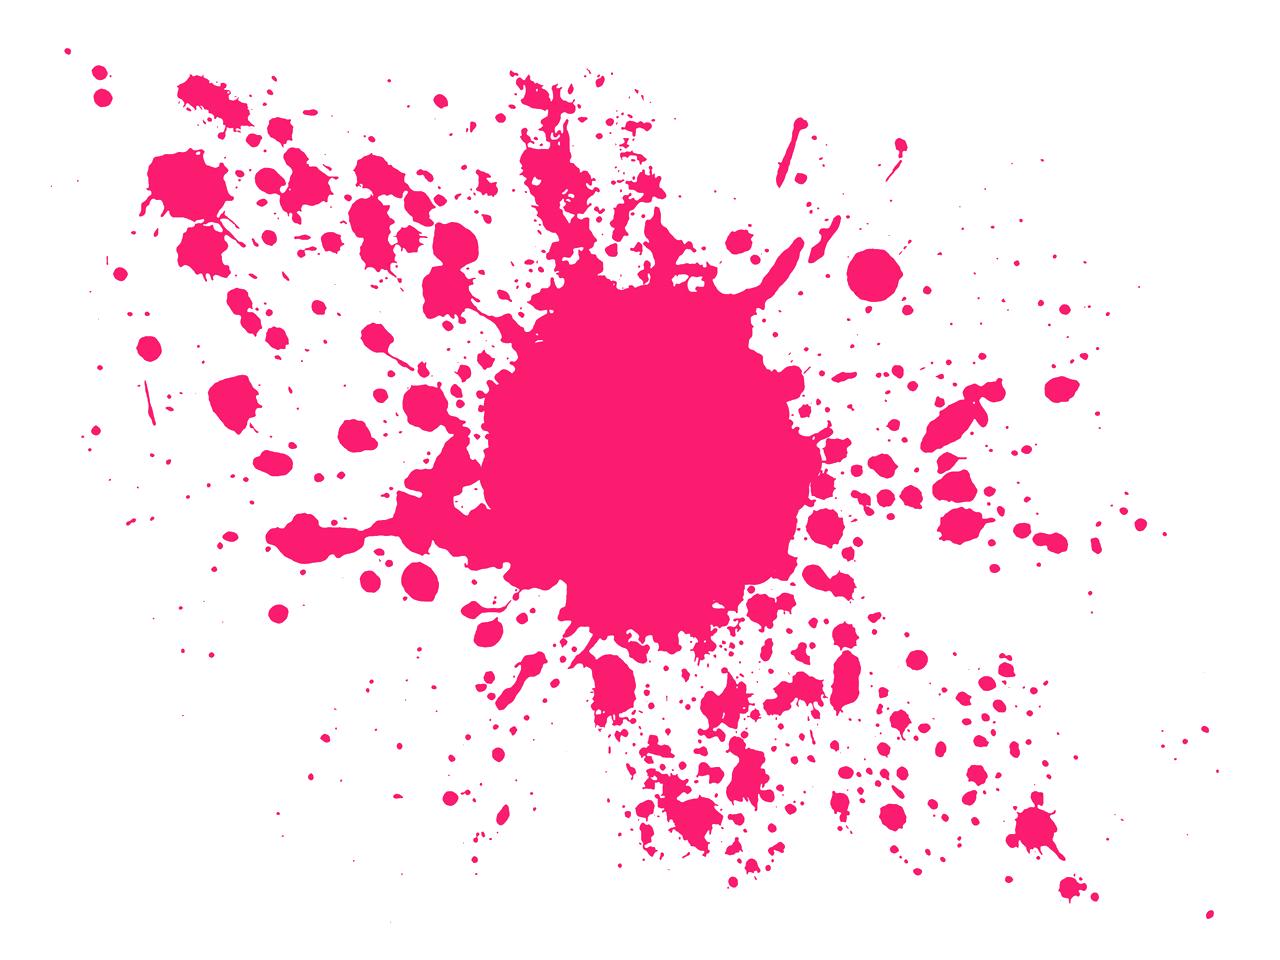 pink paint splatter clip art n3 free image